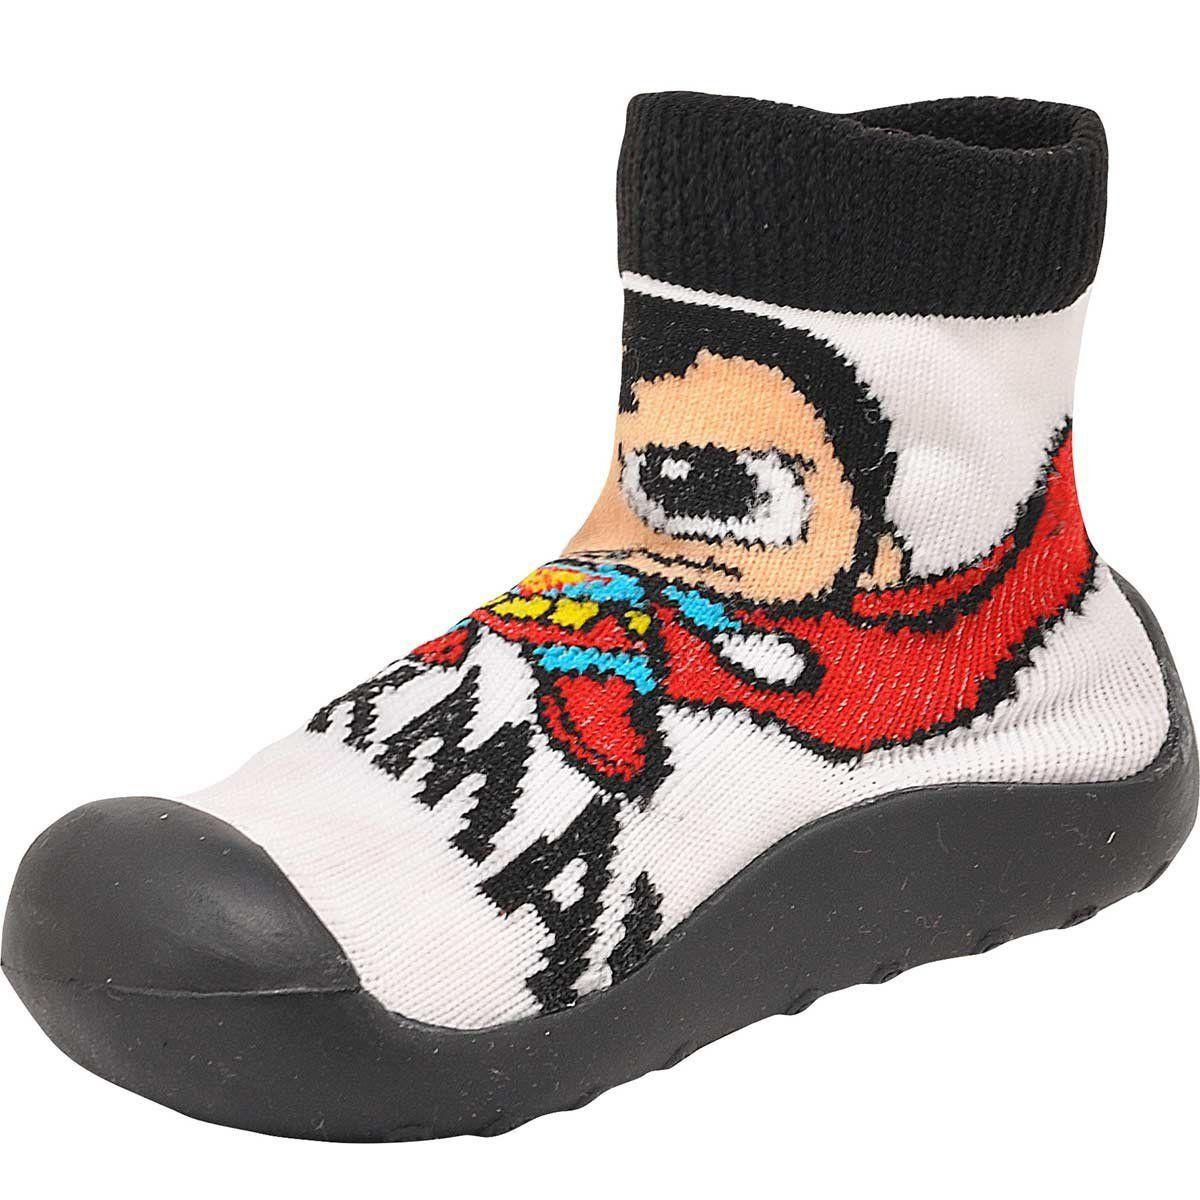 Meia Sapatilha Infantil Superman Baby Oficial  - bandUP Store Marketplace